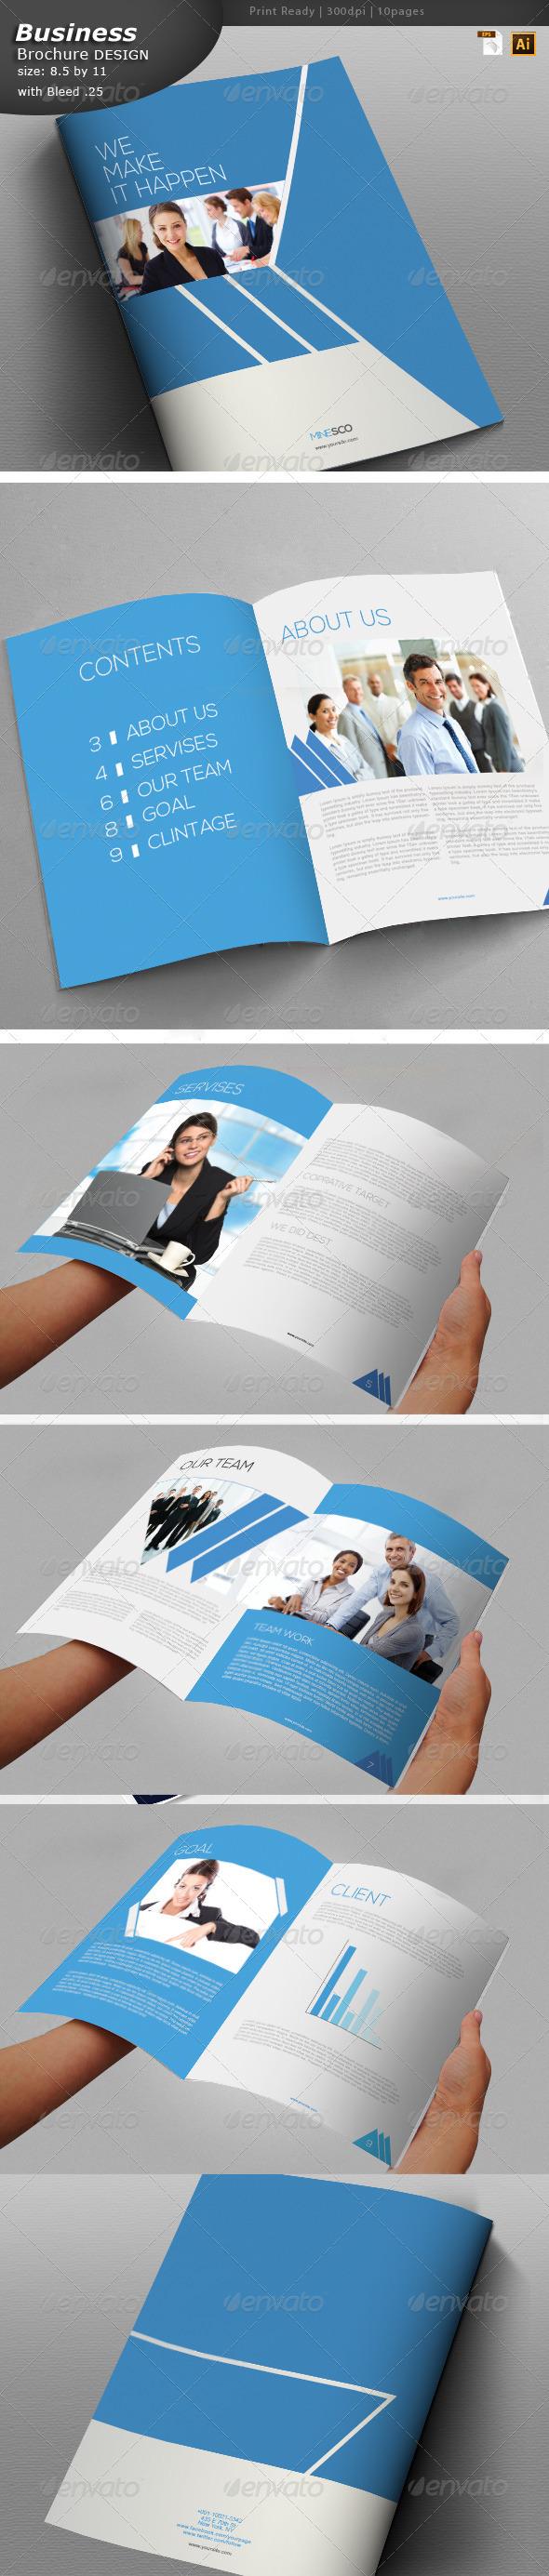 Brochure Design  - Brochures Print Templates